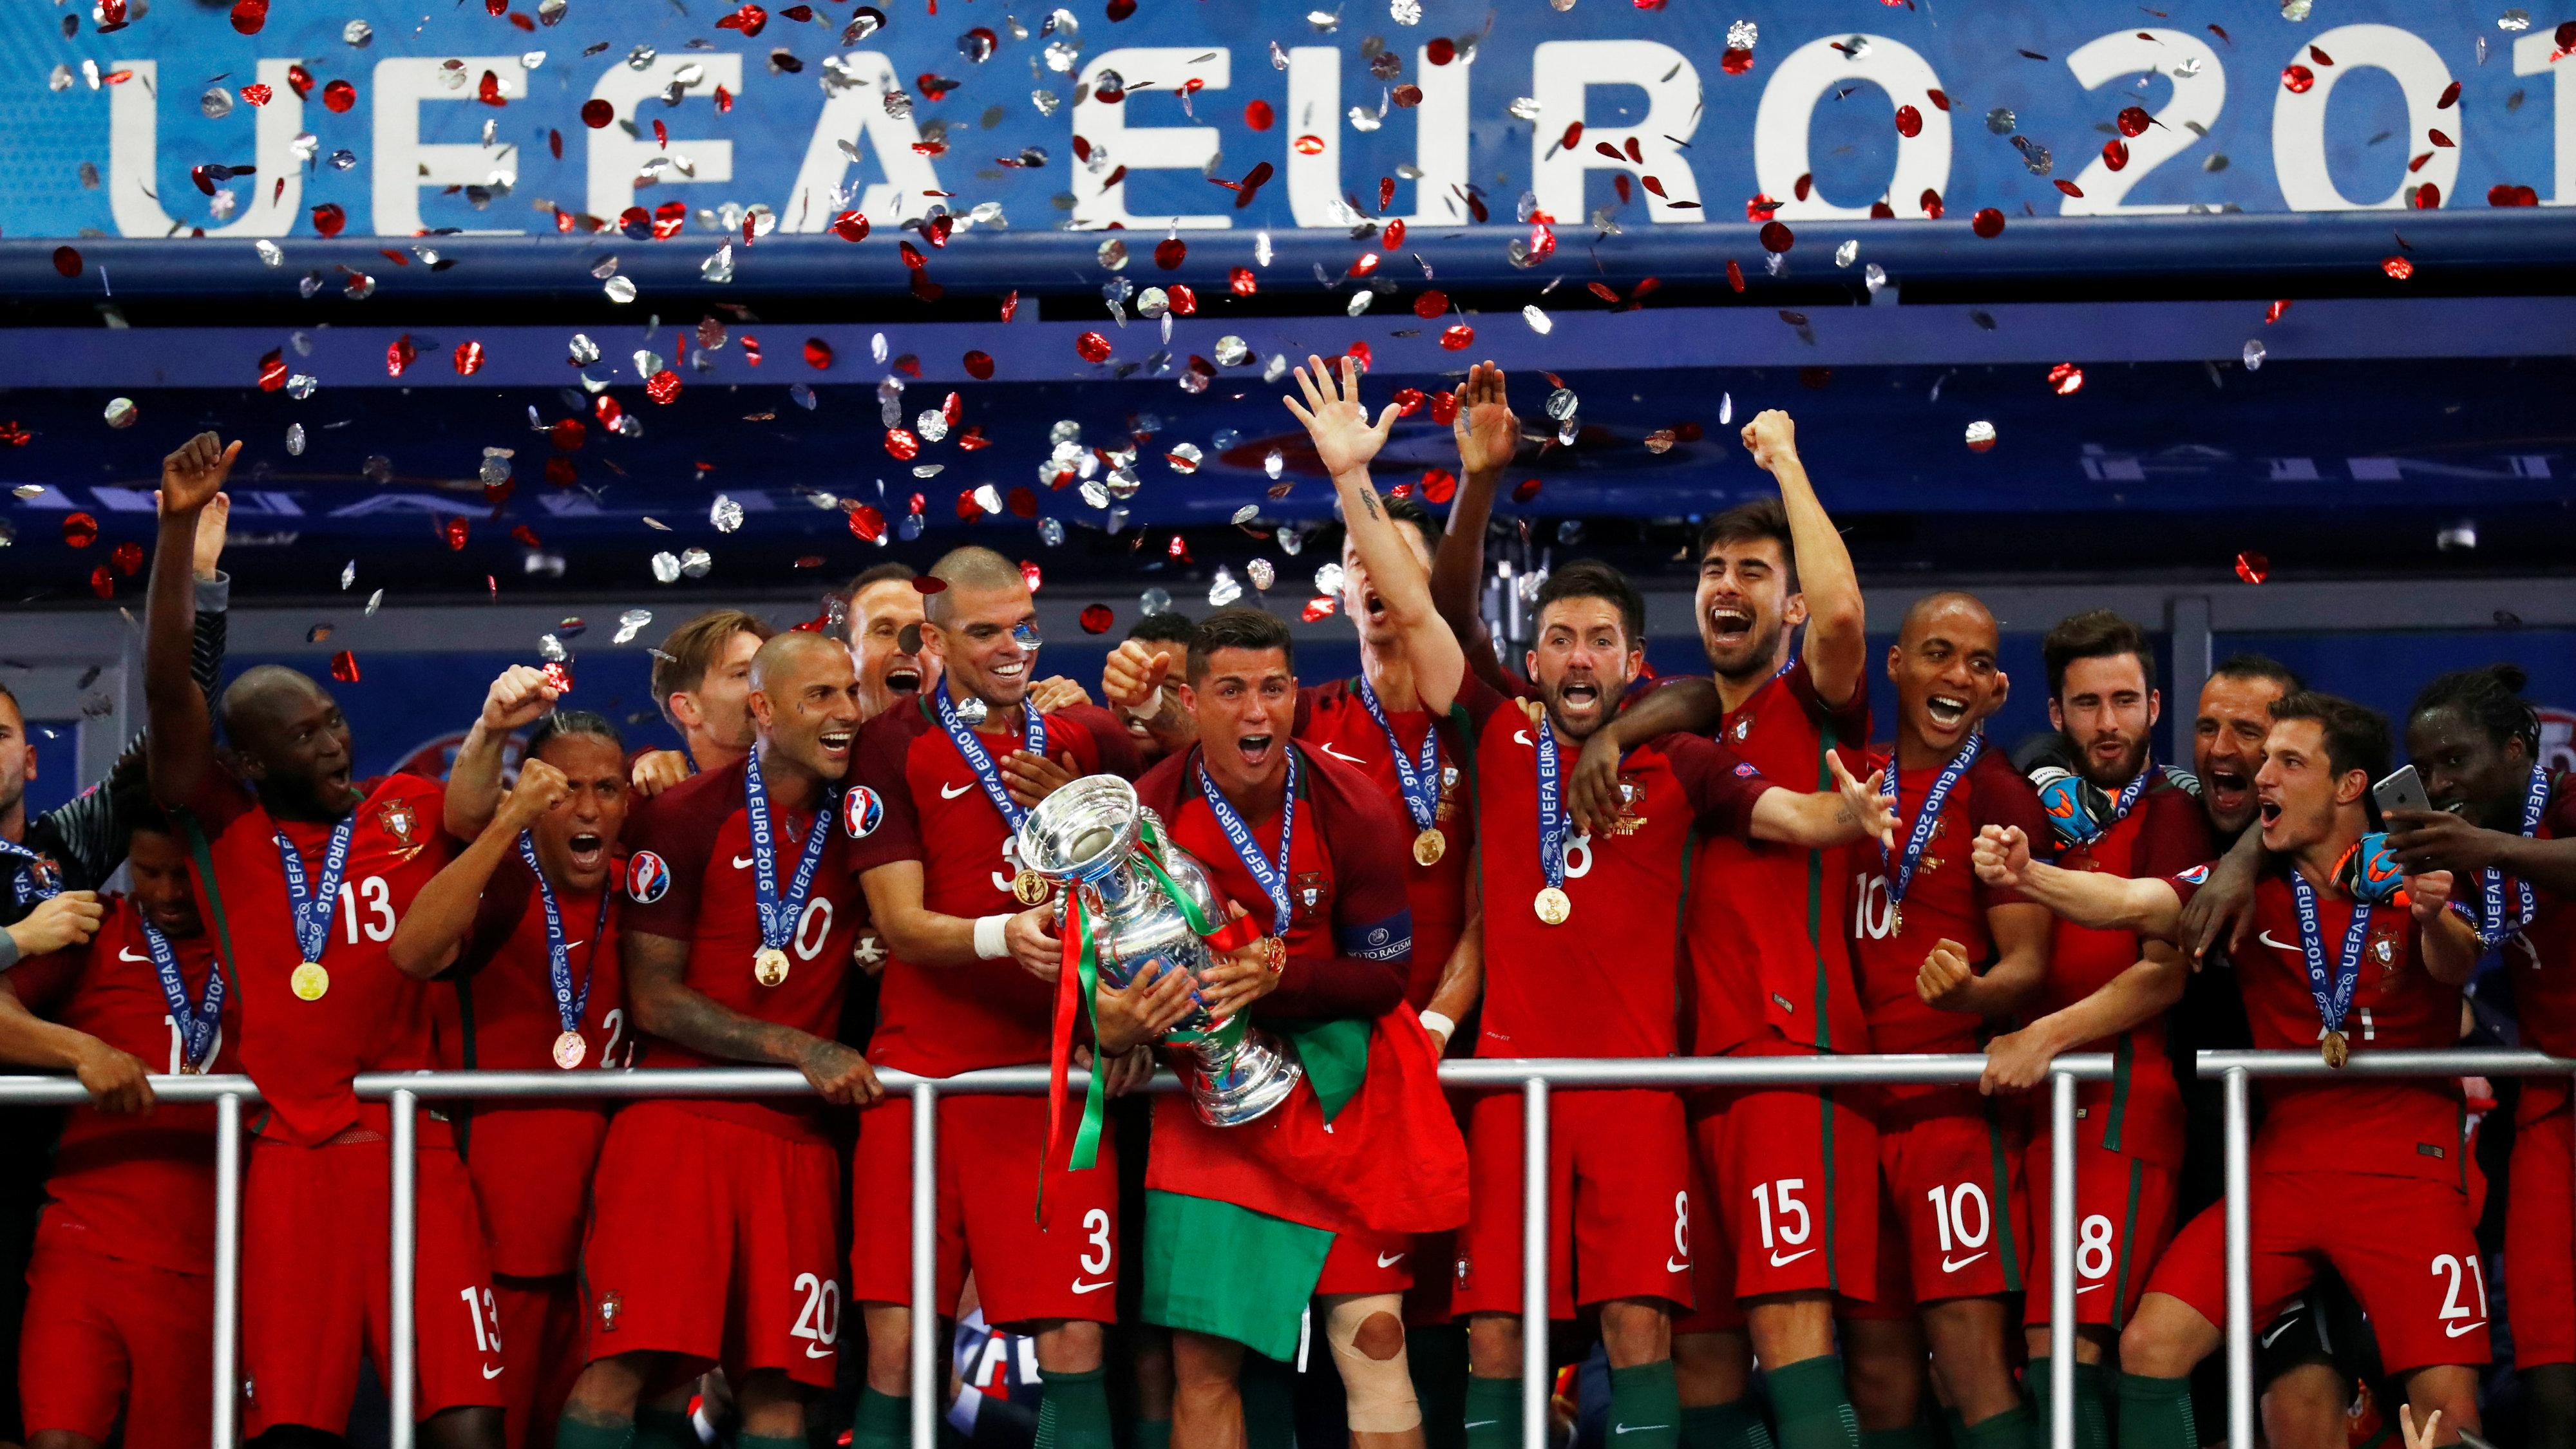 Portuguese football team celebrate Euros 2016 win